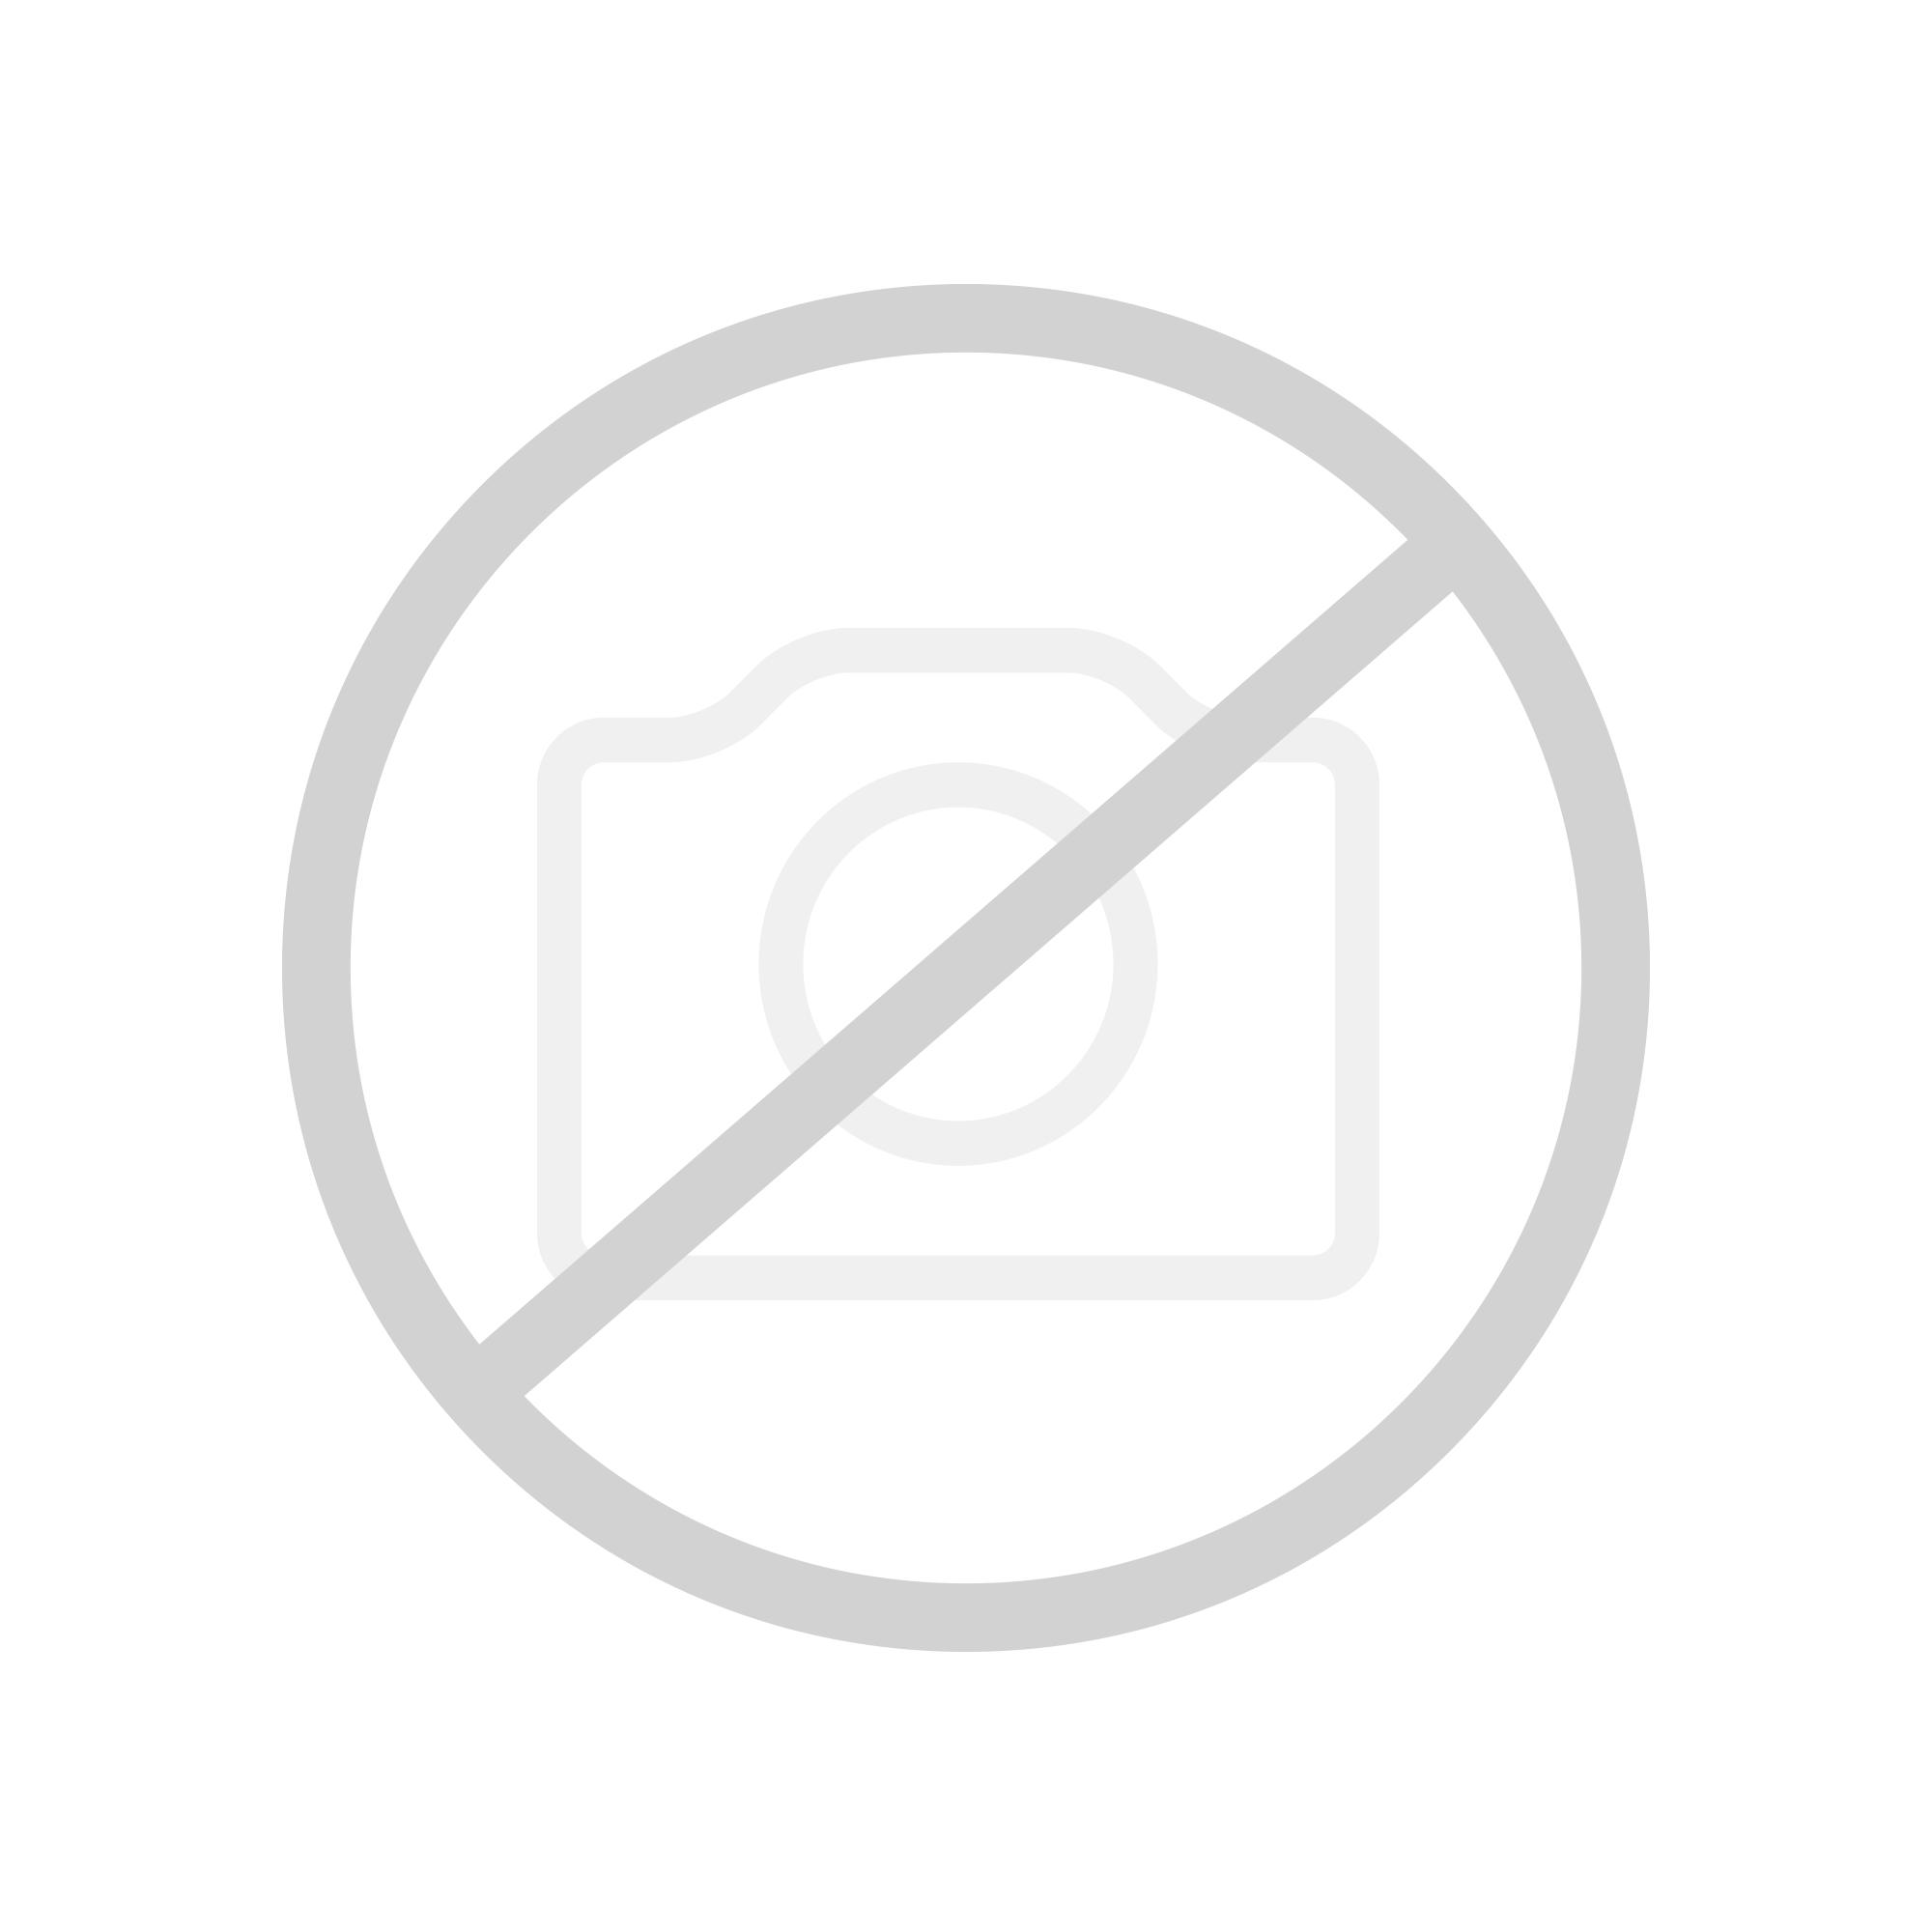 grohe armaturen online bestellen im reuter shop. Black Bedroom Furniture Sets. Home Design Ideas